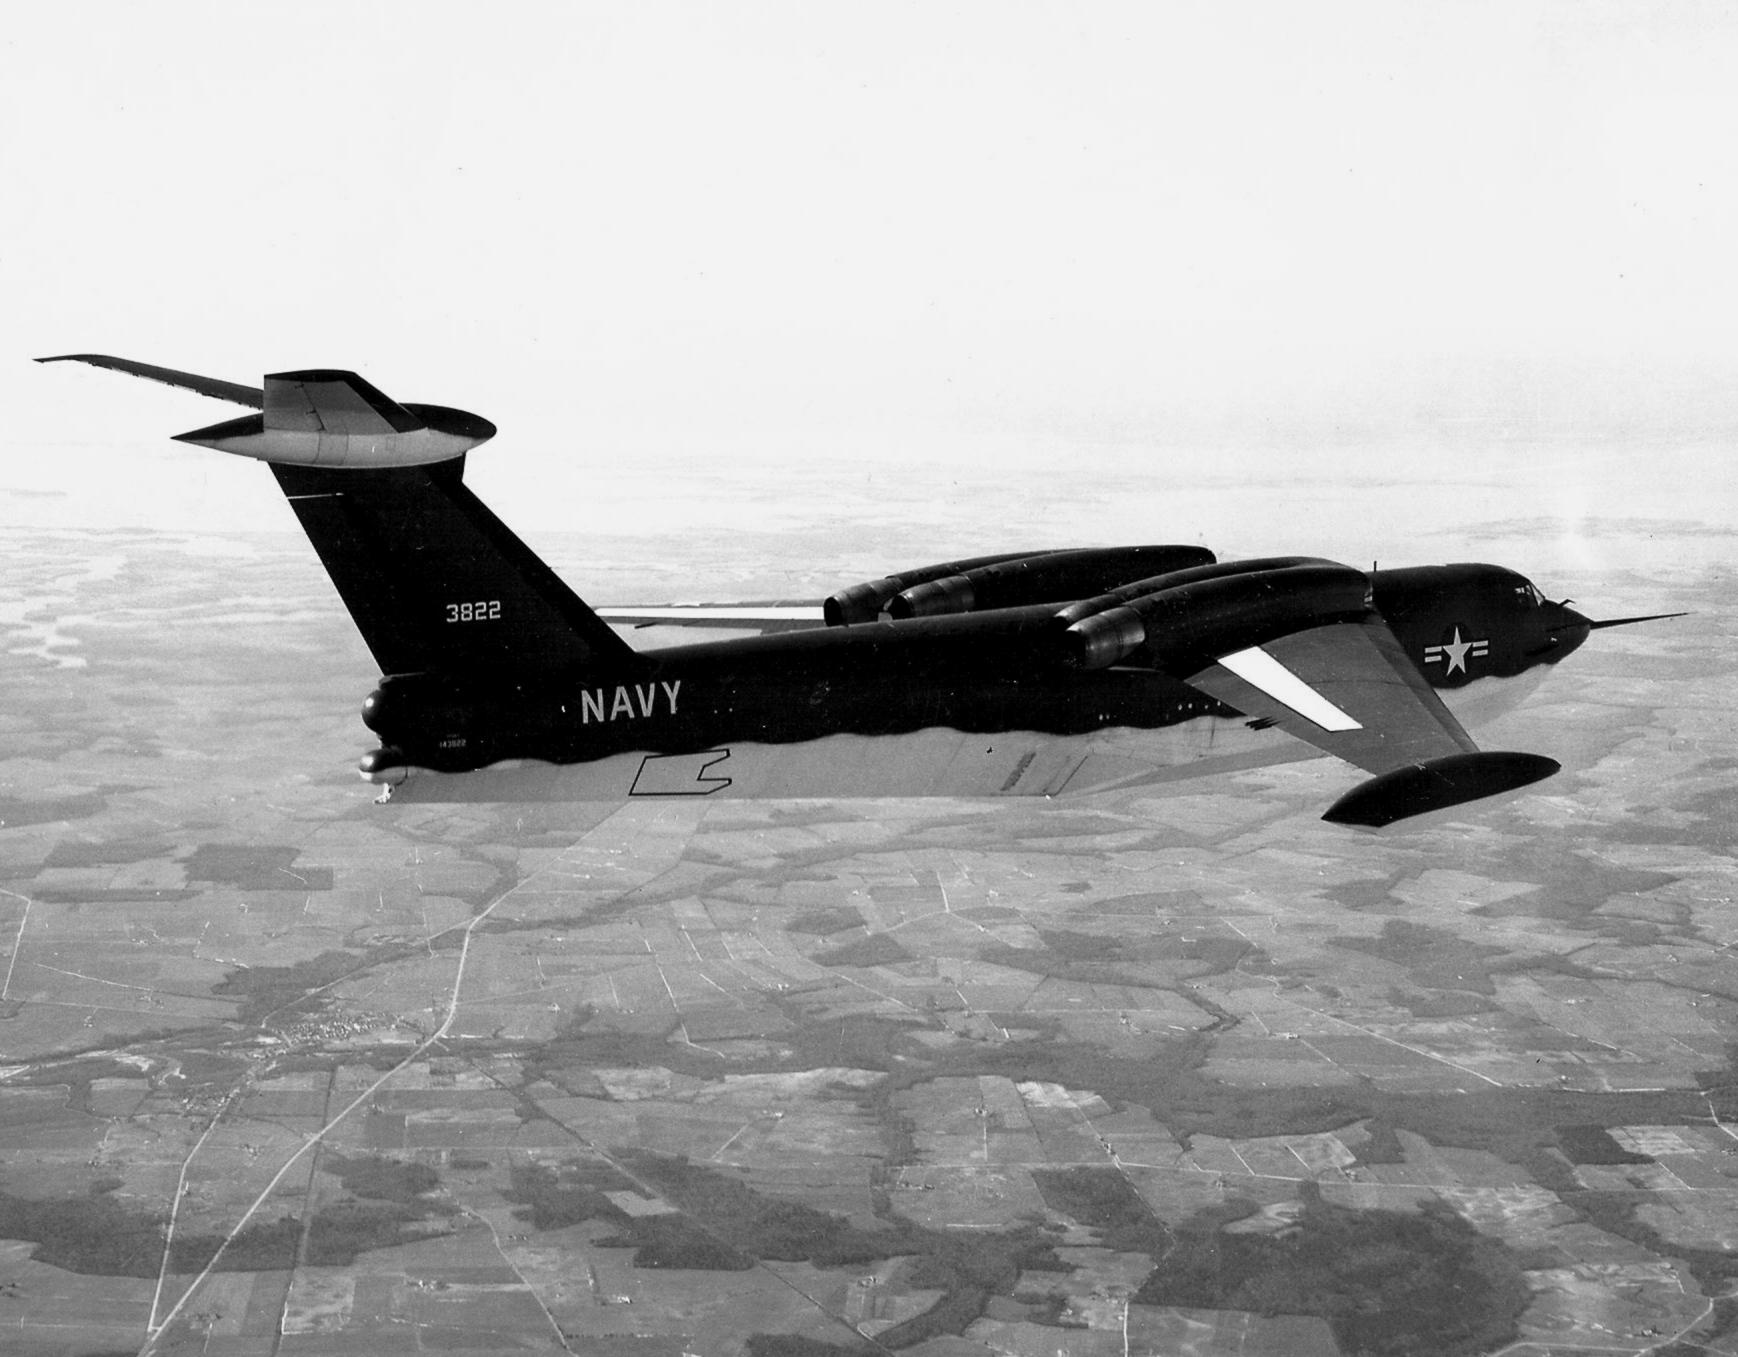 https://upload.wikimedia.org/wikipedia/commons/e/e0/Martin_YP6M-1_Seamaster_in_flight.jpg